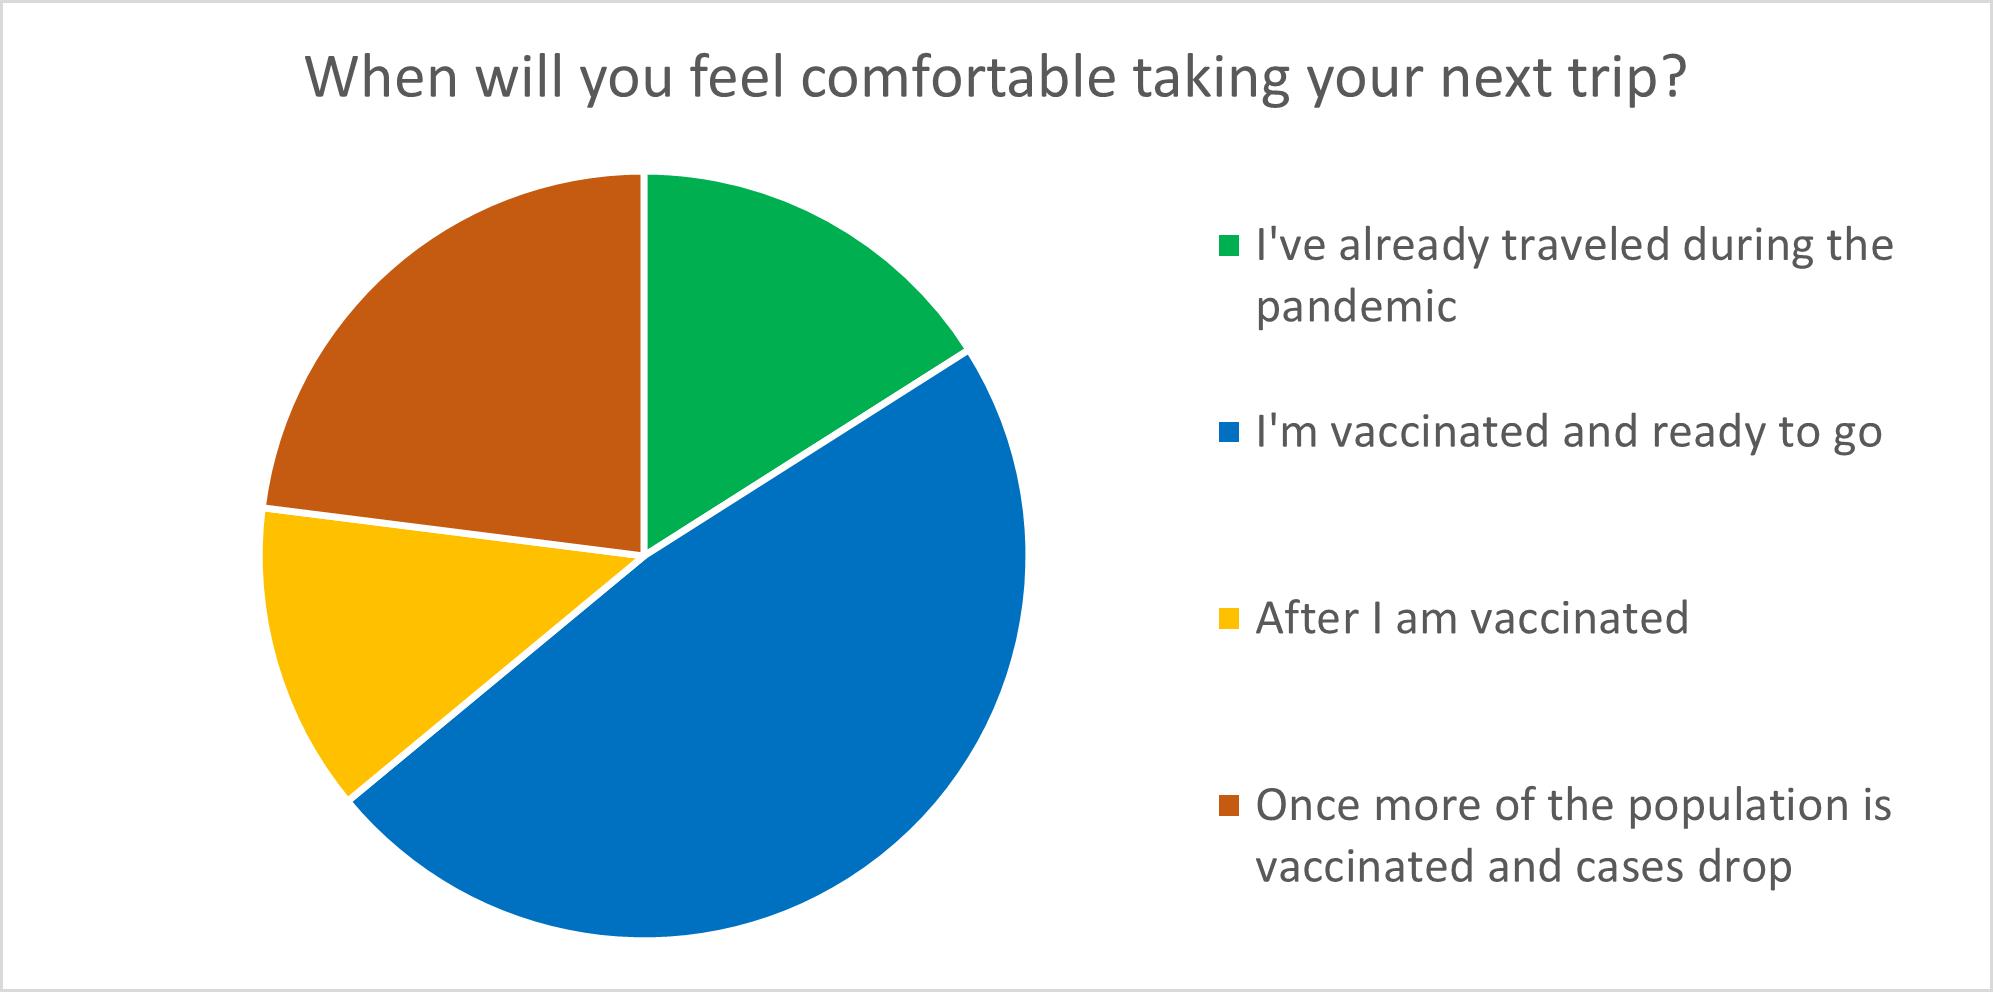 Travel survey results